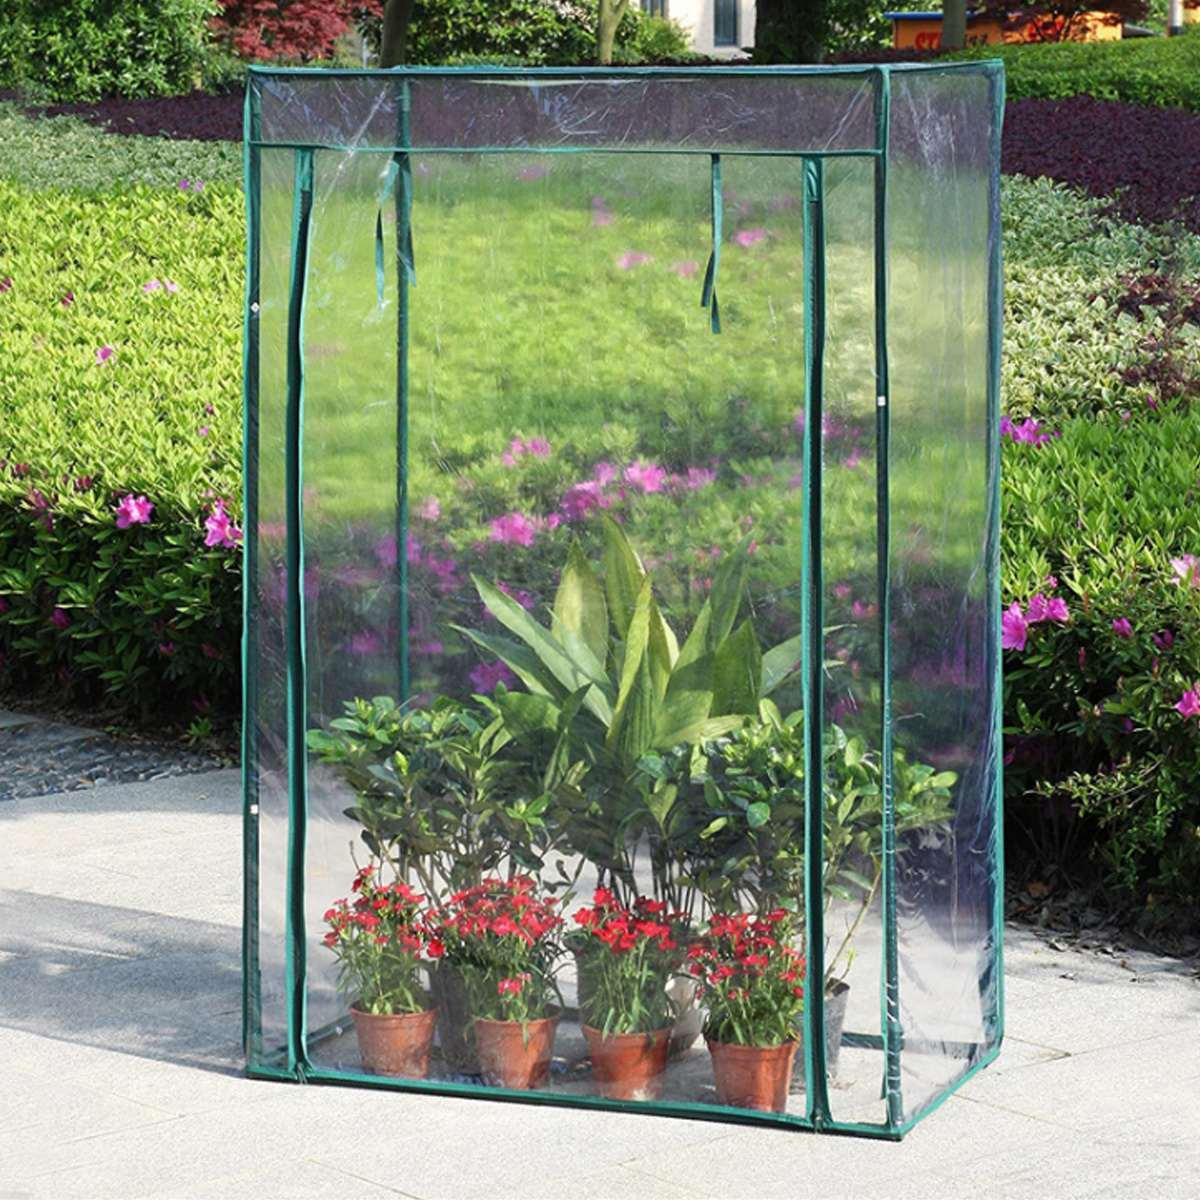 capa mini aquecedor de jardim capa impermeável